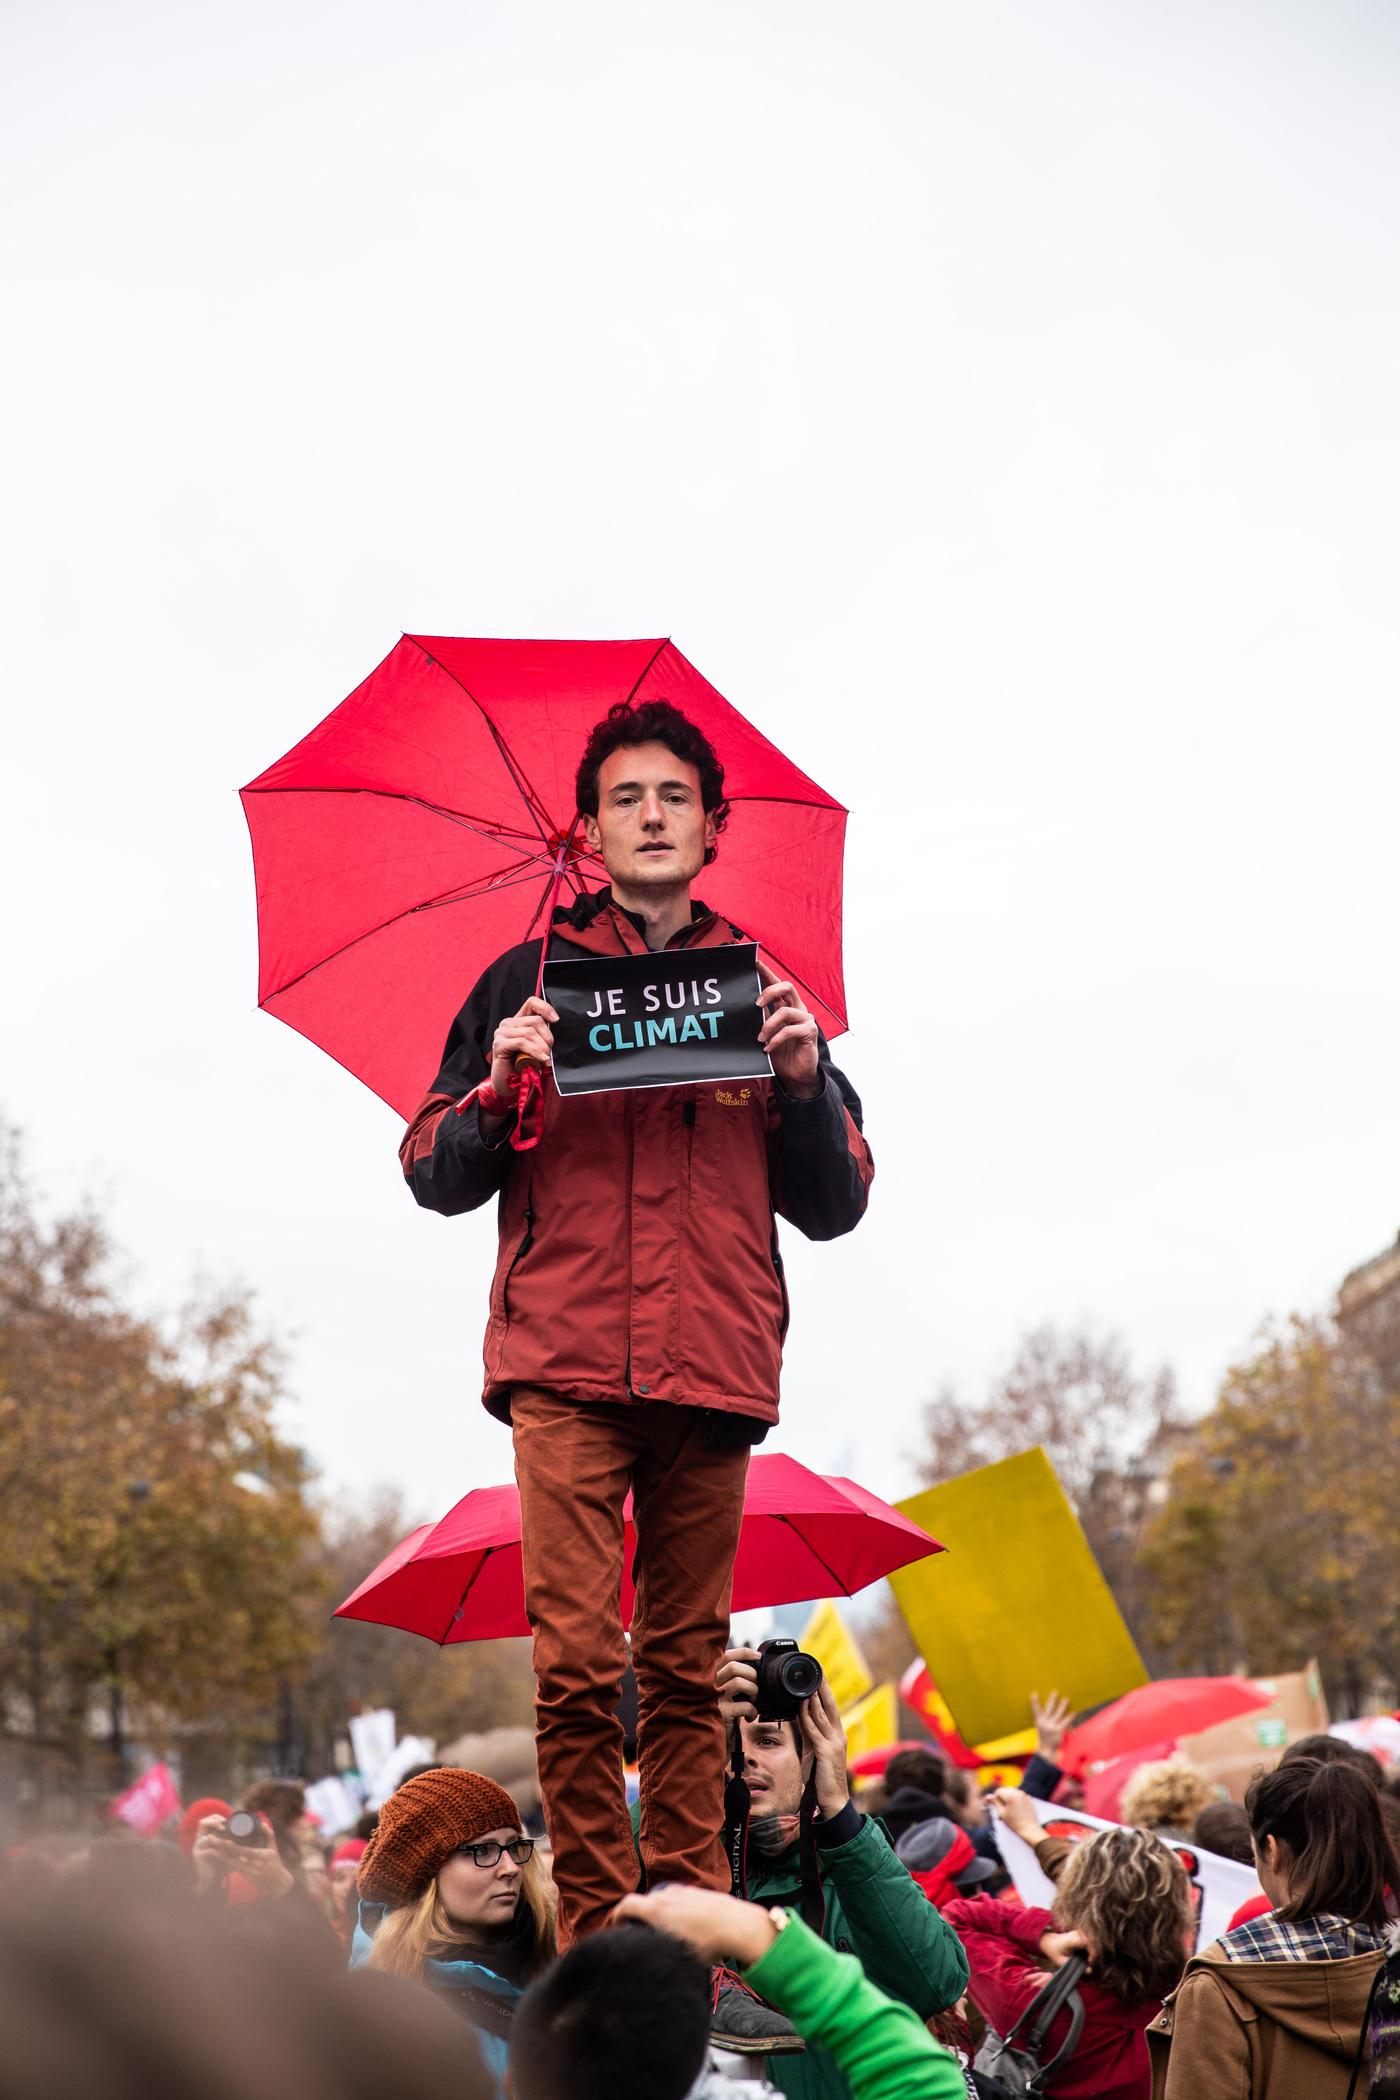 Adam Karls Johansson - COP 21 in Paris